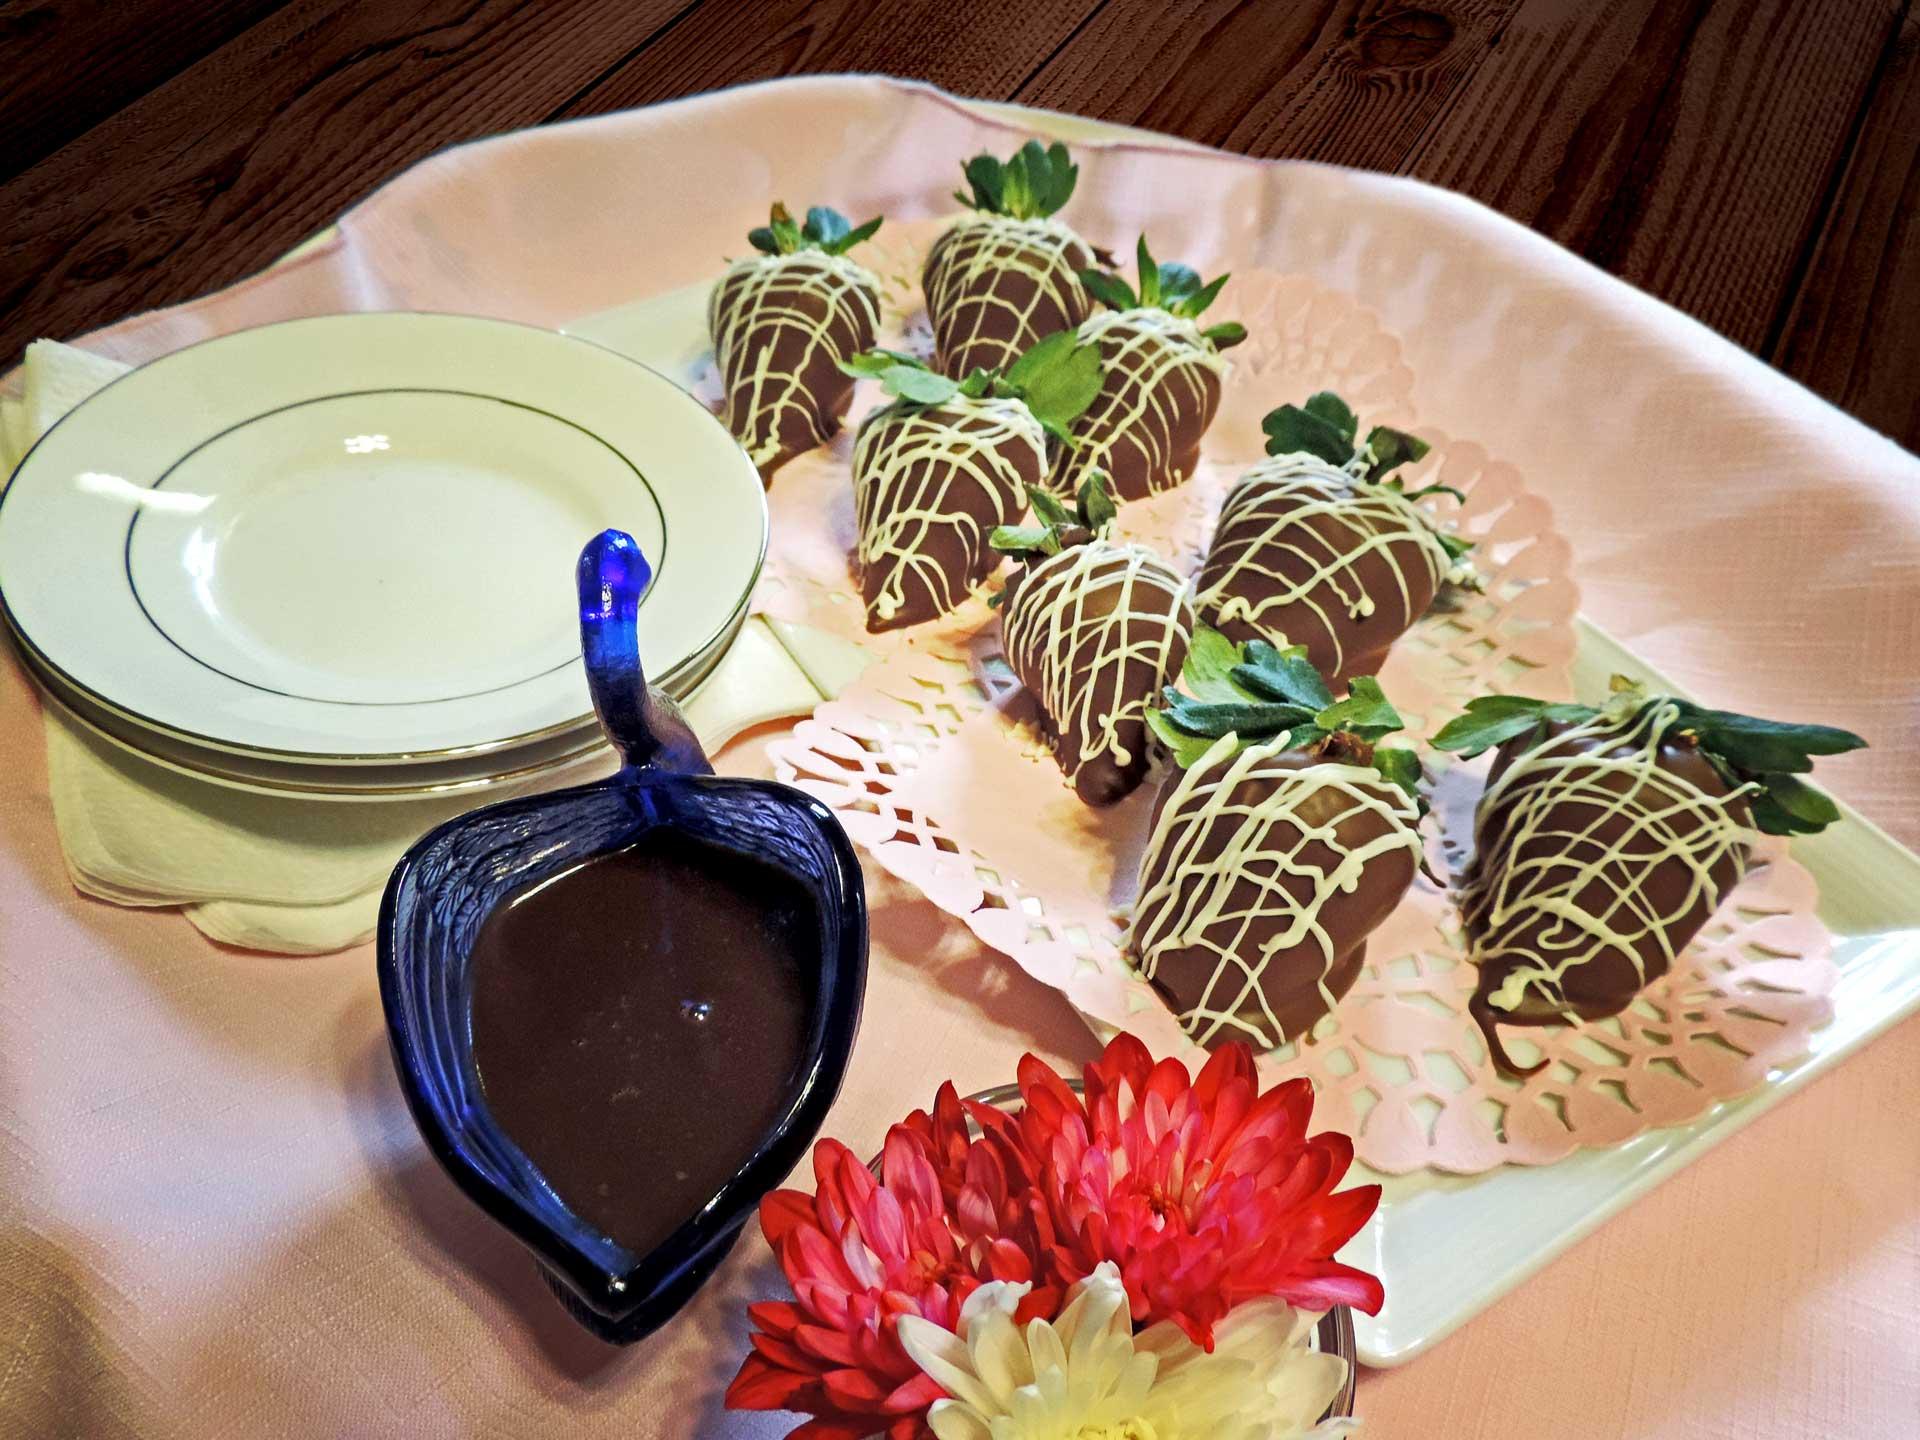 Chocolate-Dipped-Strawberries-New-Version.jpg